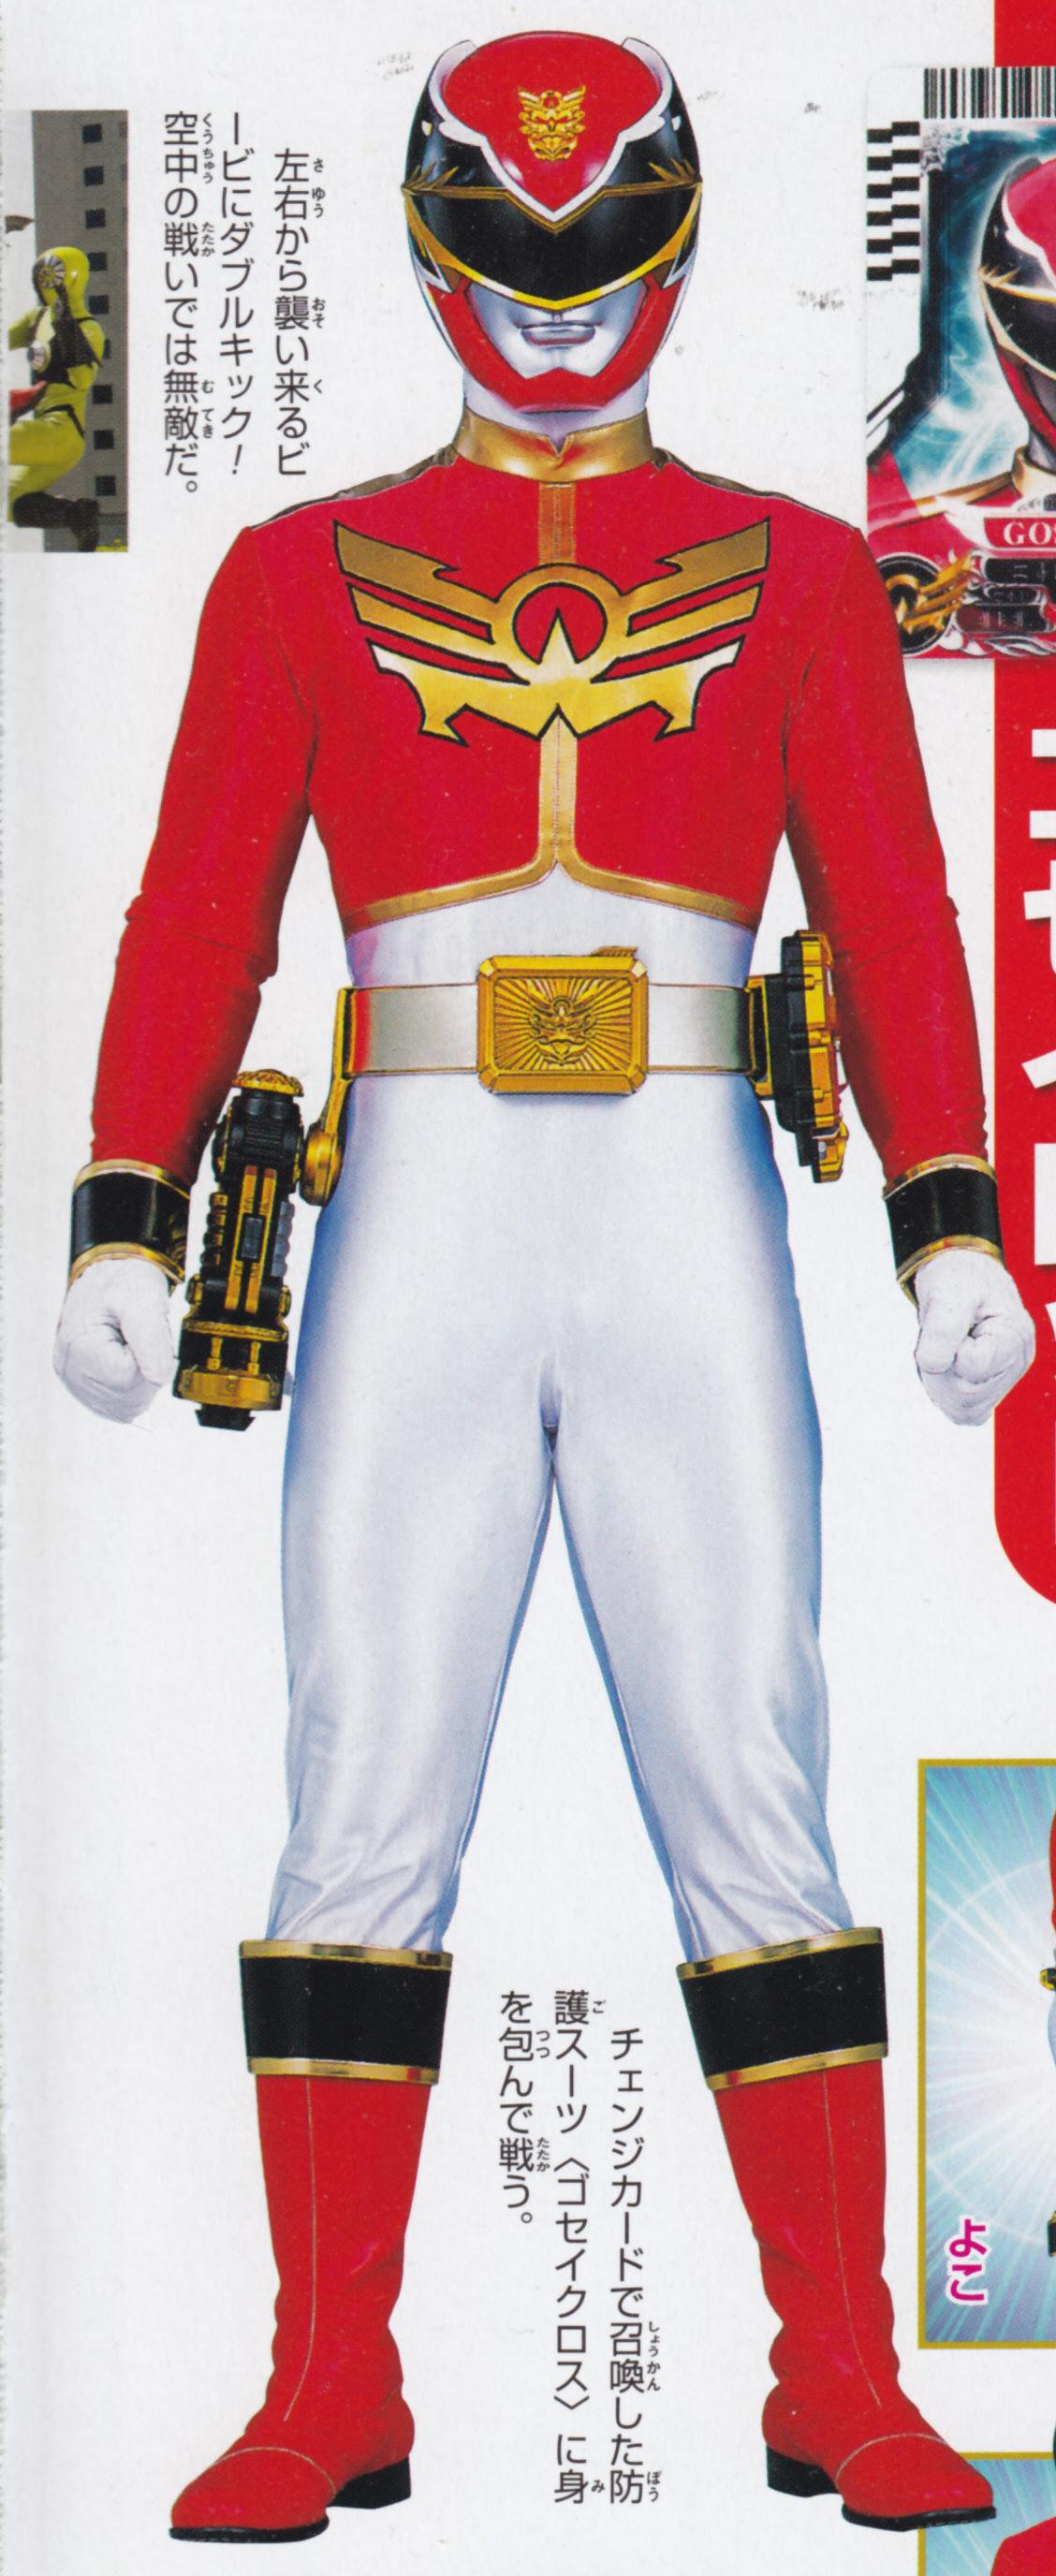 Category Red Ranger Rangerwiki The Super Sentai And Power Rangers Wiki Power Rangers Megaforce Power Rangers Super Megaforce Power Rangers